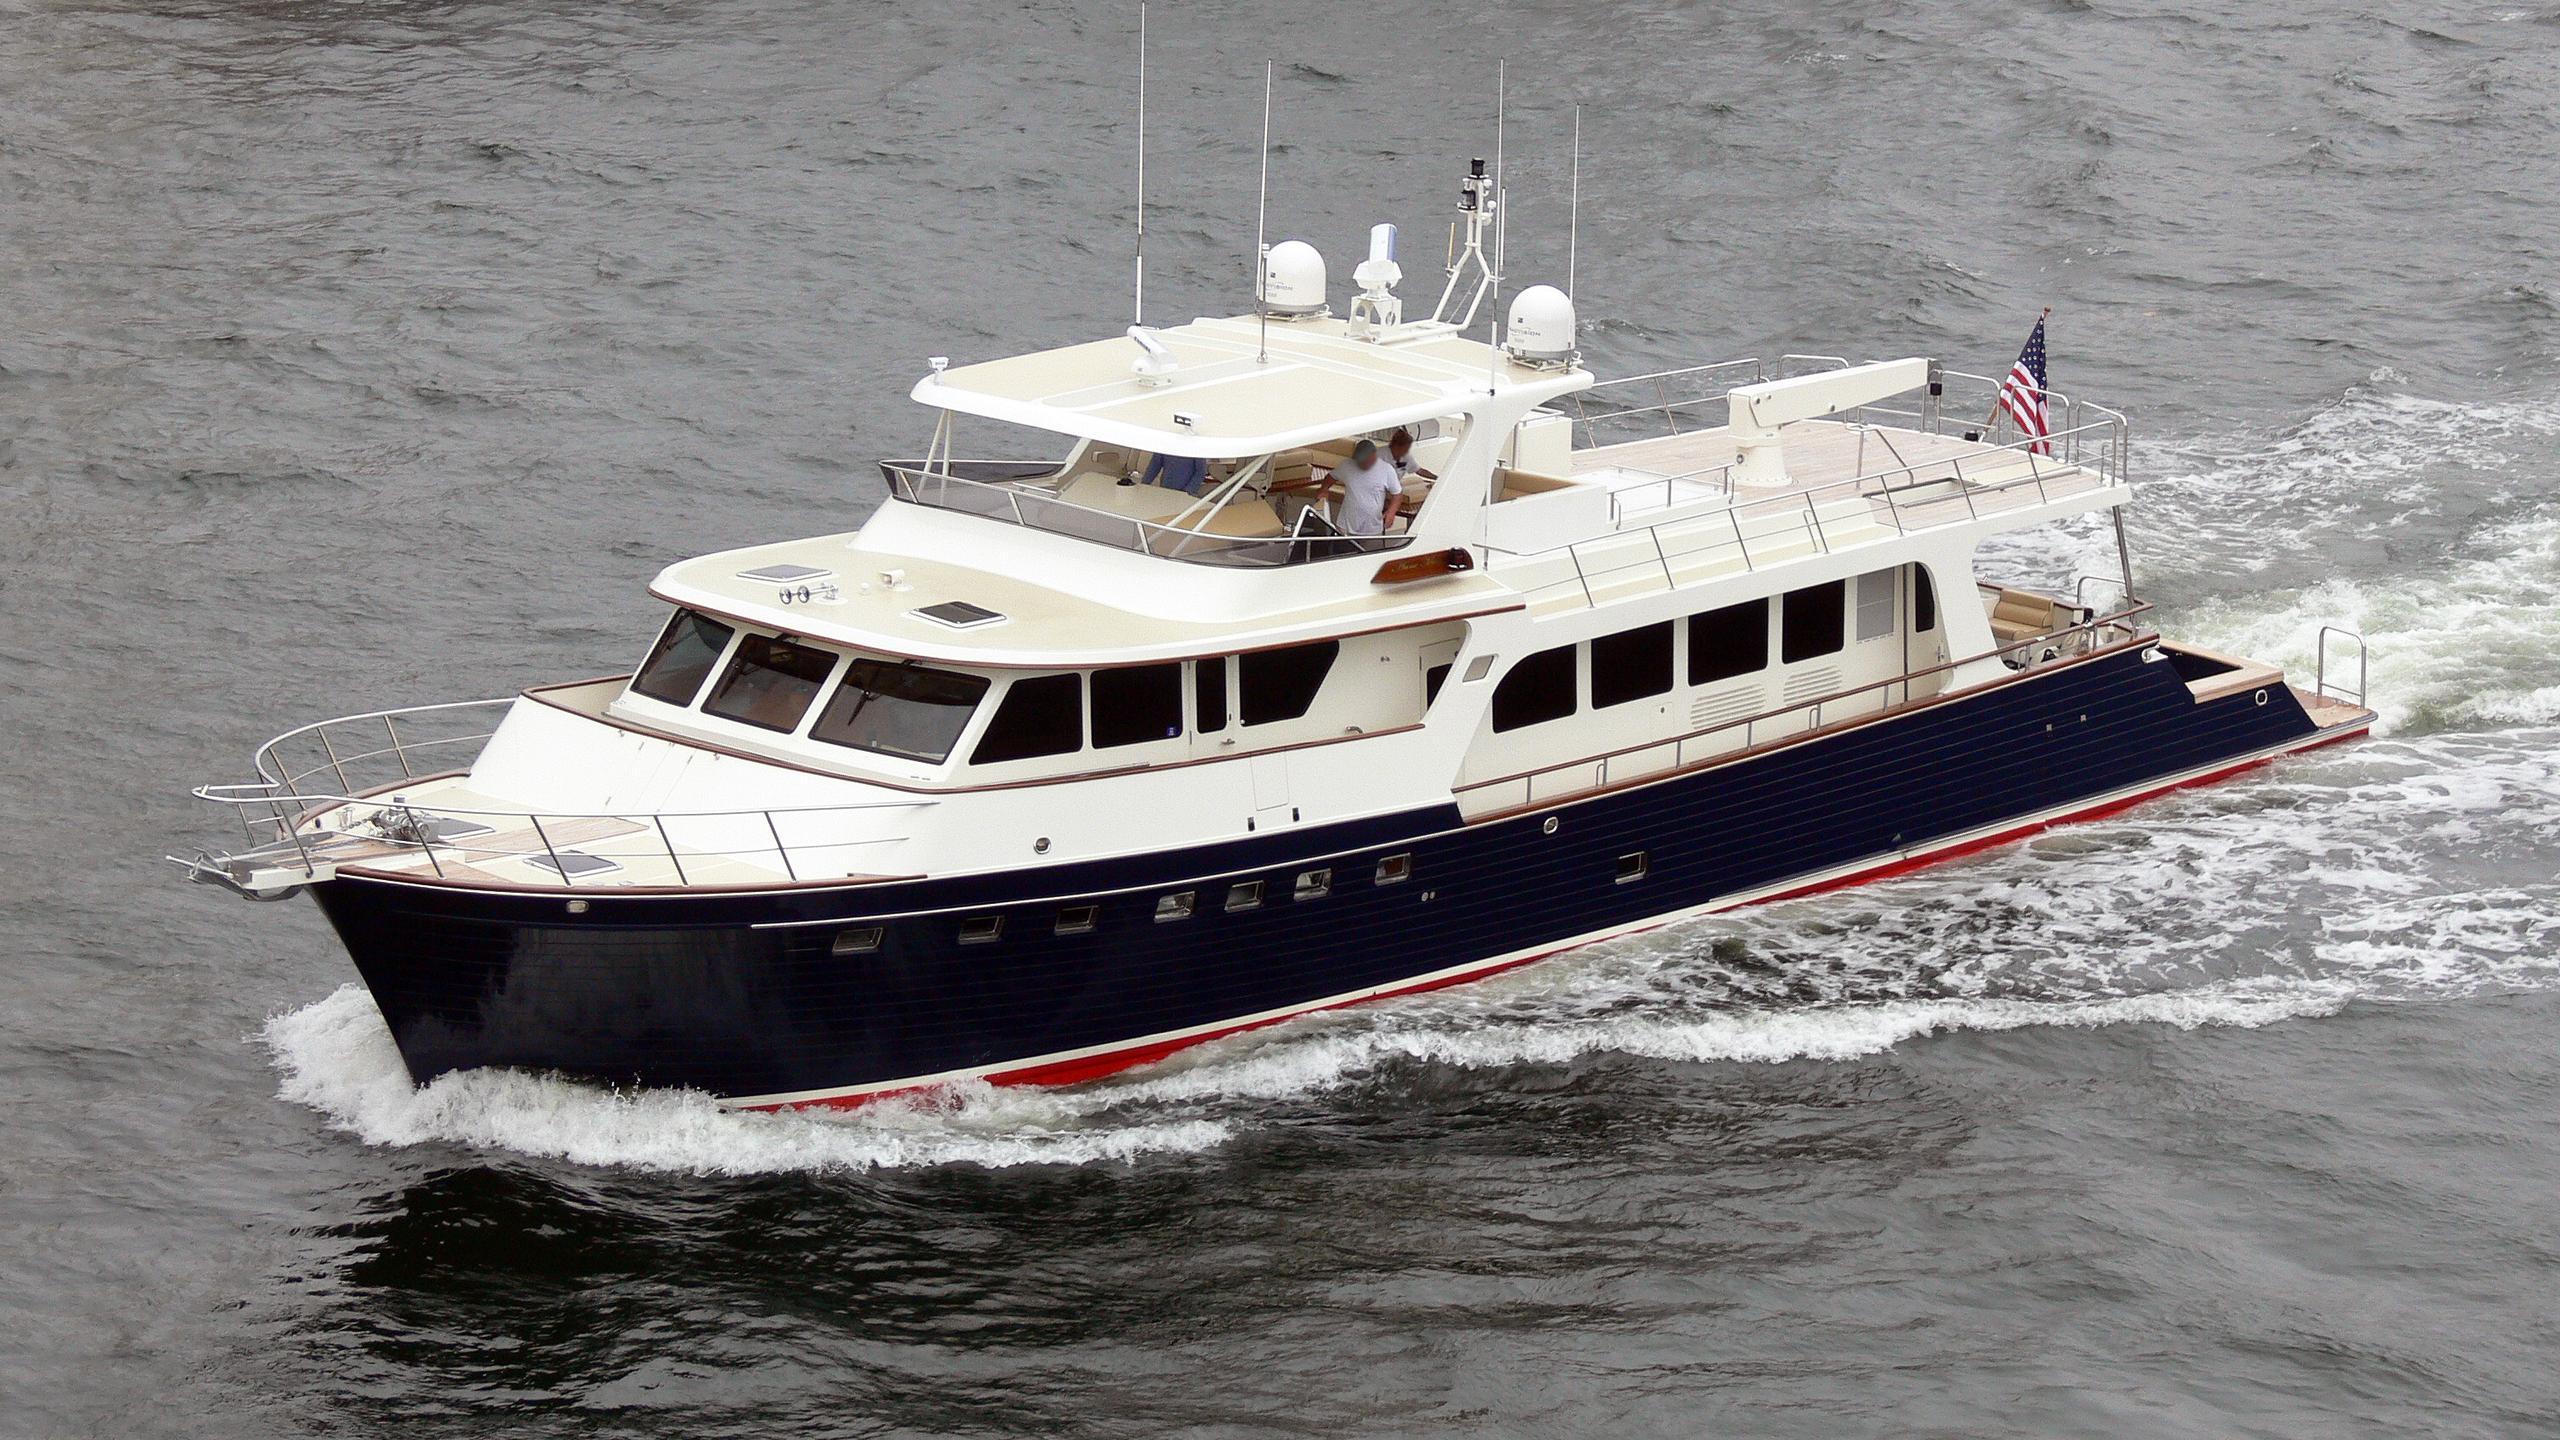 anne-mary-explorer-yacht-marlow-norsemen-86c-2008-27m-cruising